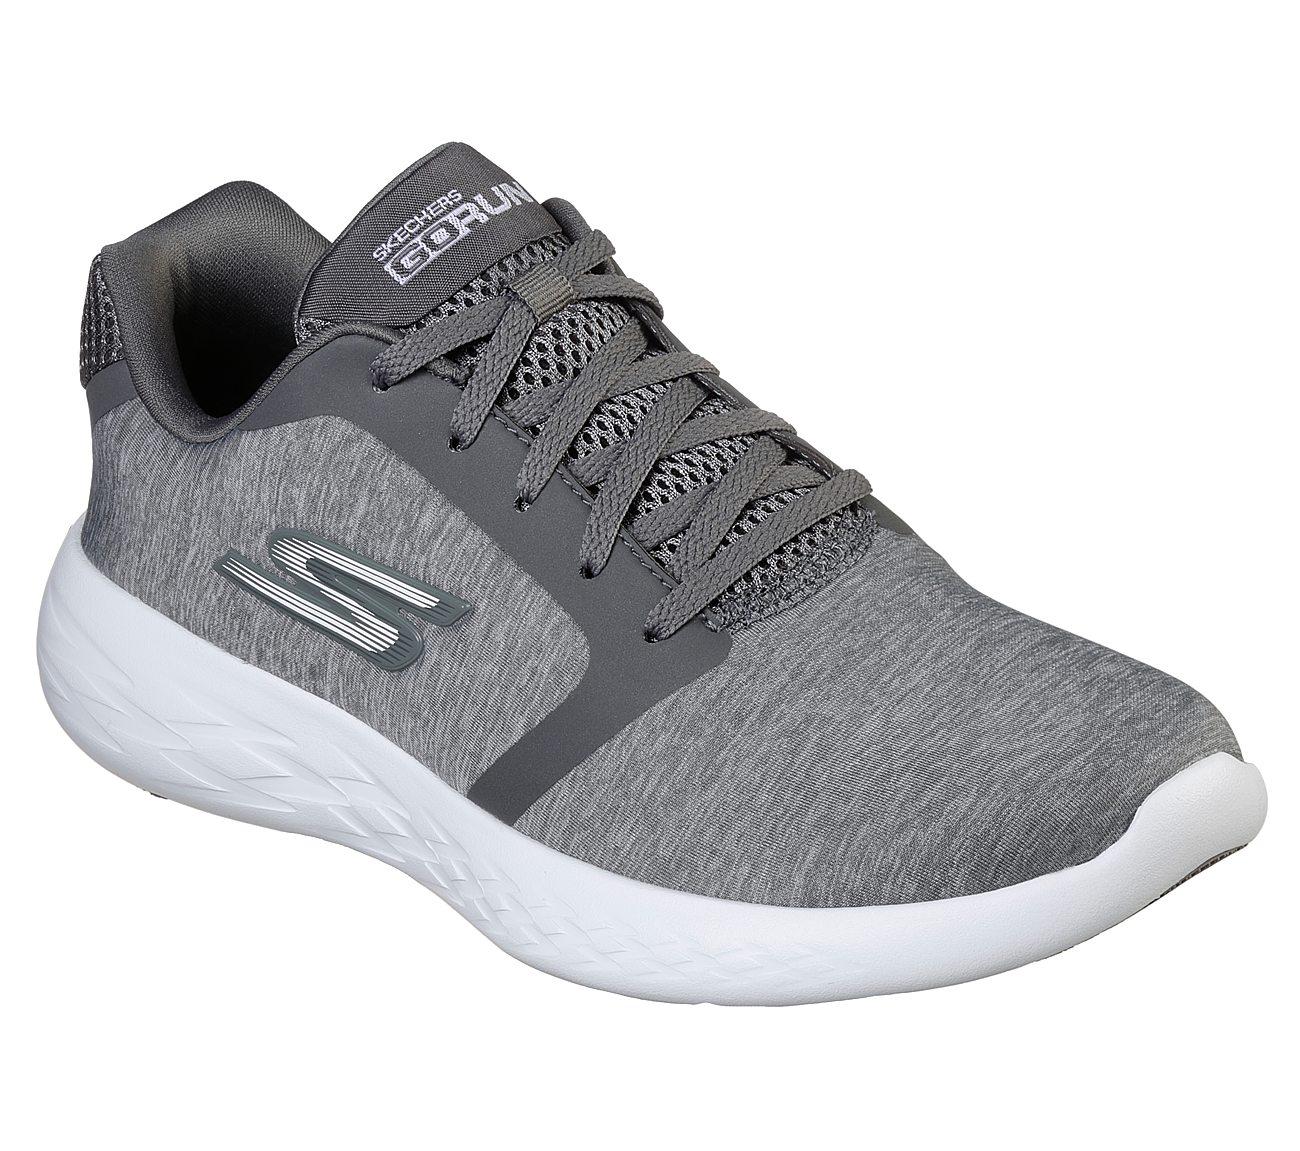 Ausencia Decir Factibilidad  Buy SKECHERS Skechers GOrun 600 - Divert Running Shoes Shoes